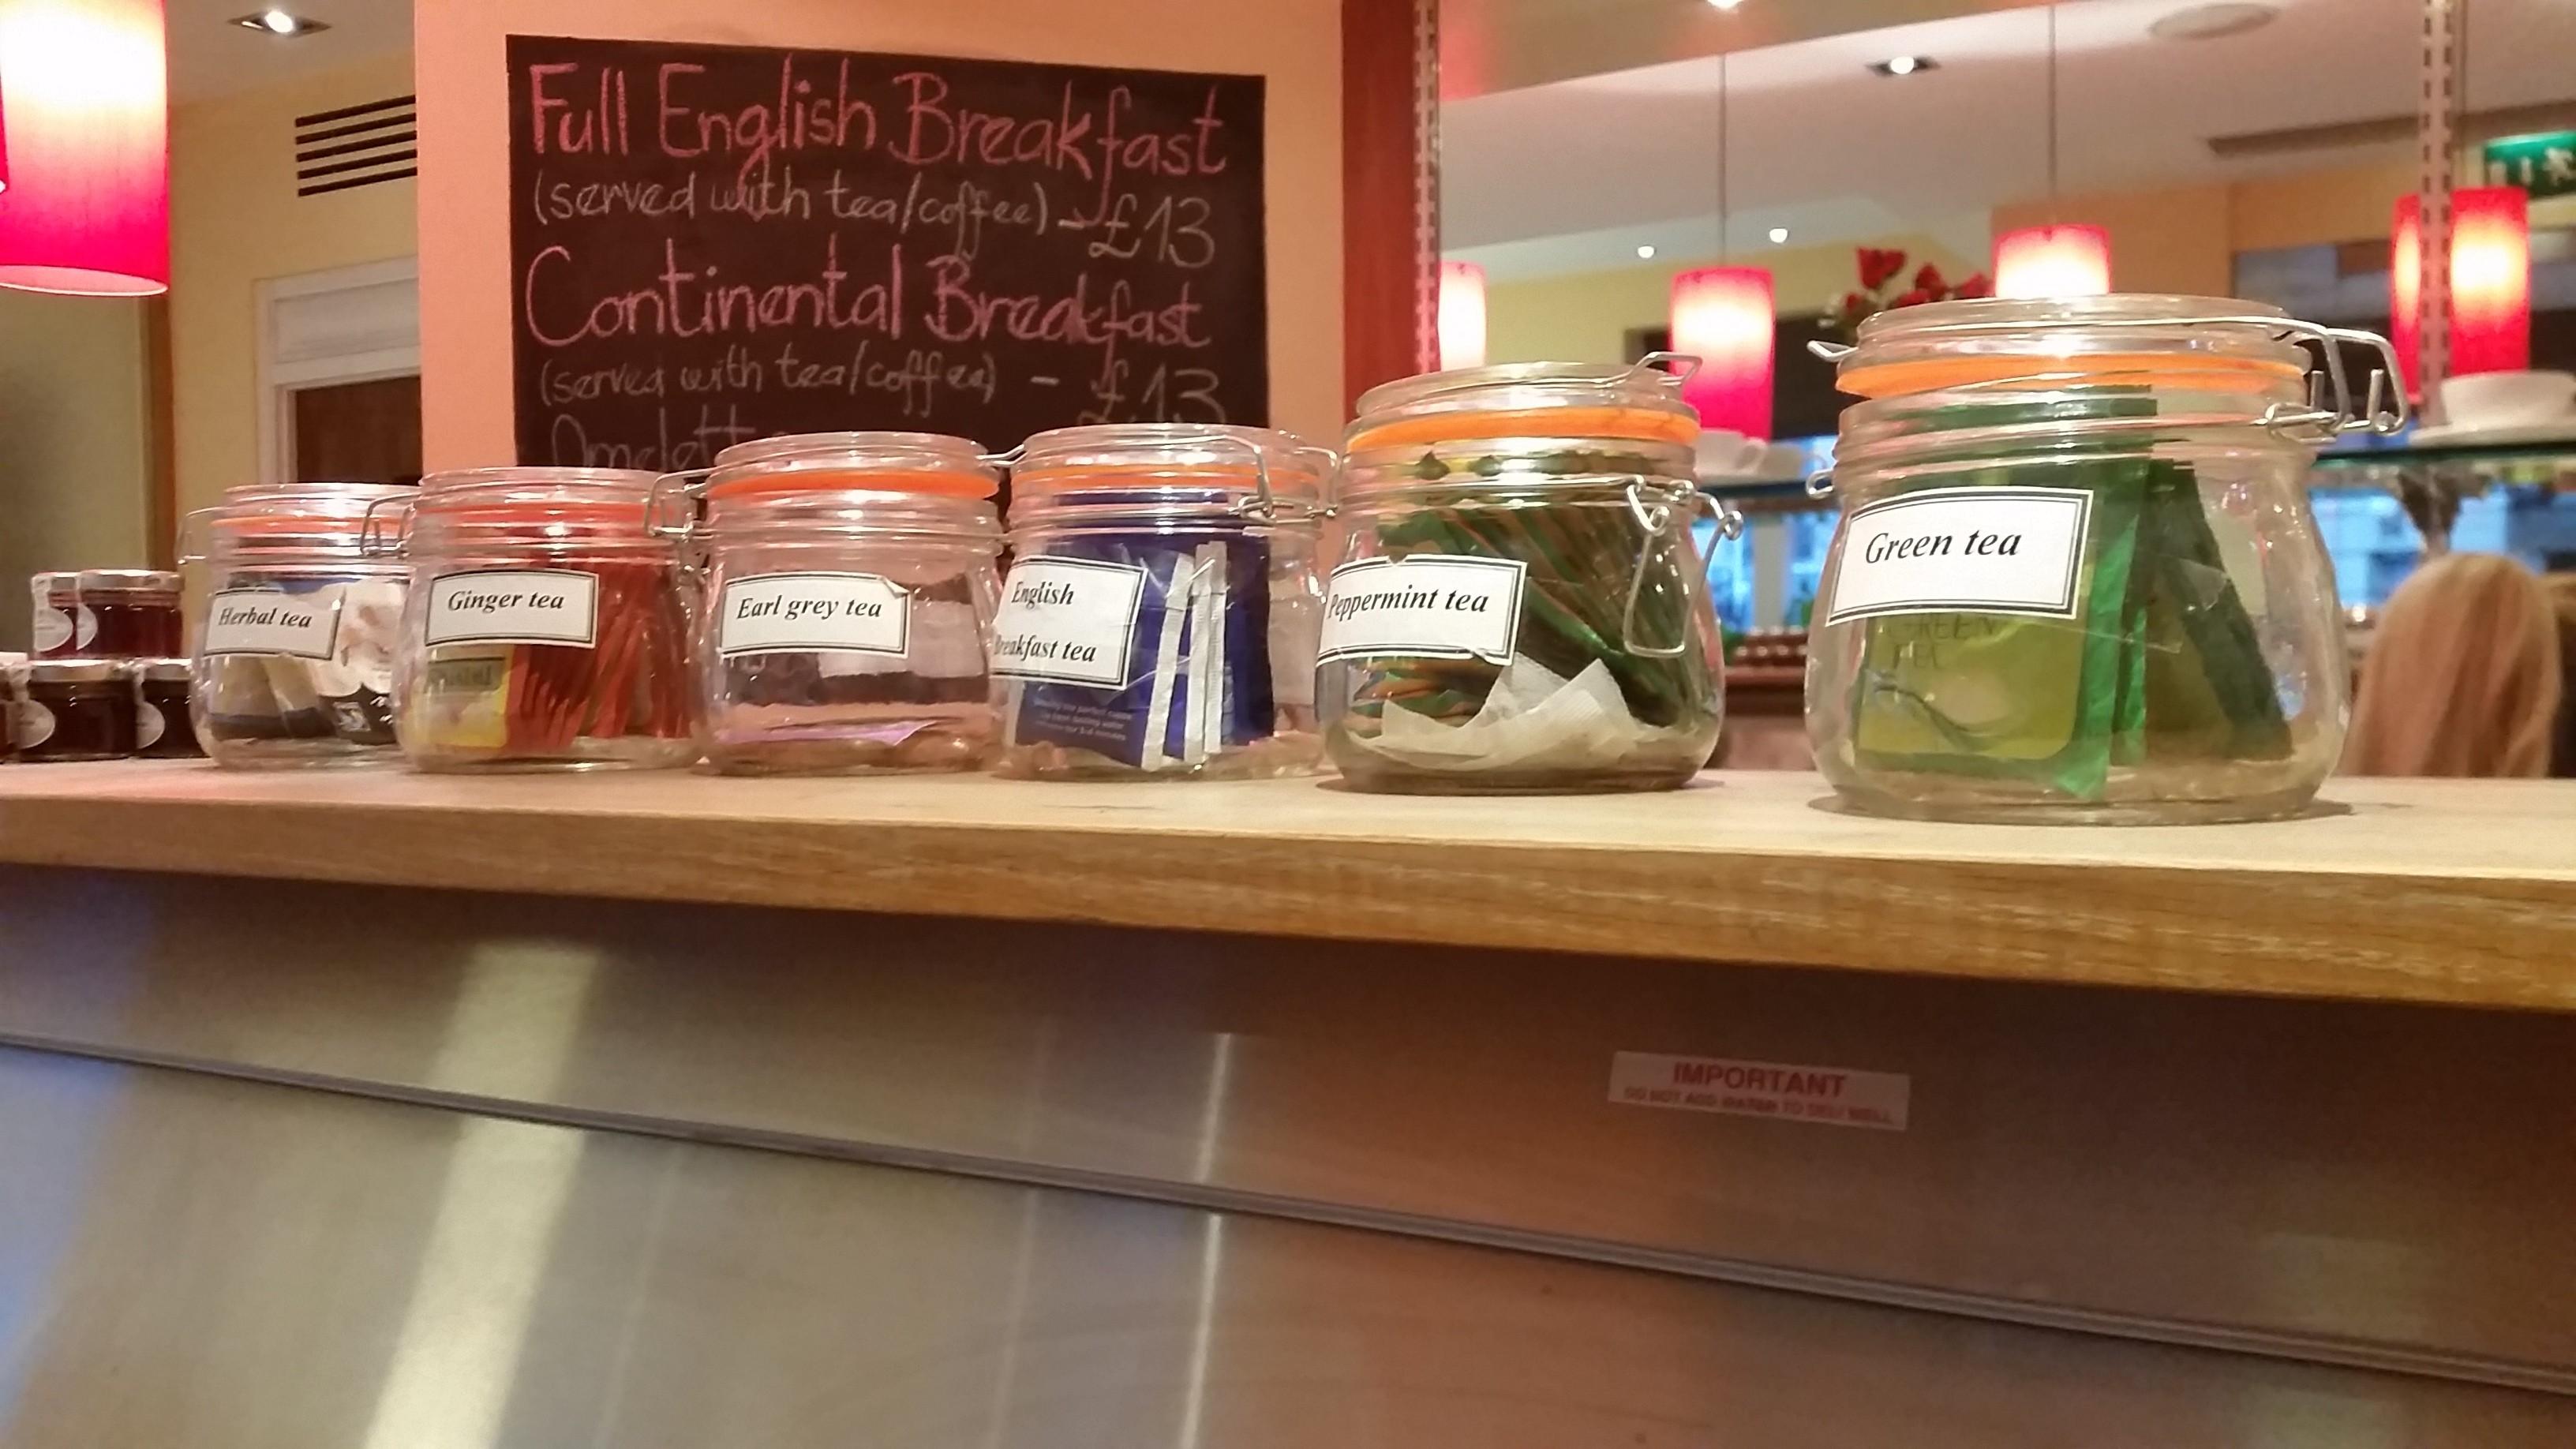 20181206_082952.jpg - Selection of tea